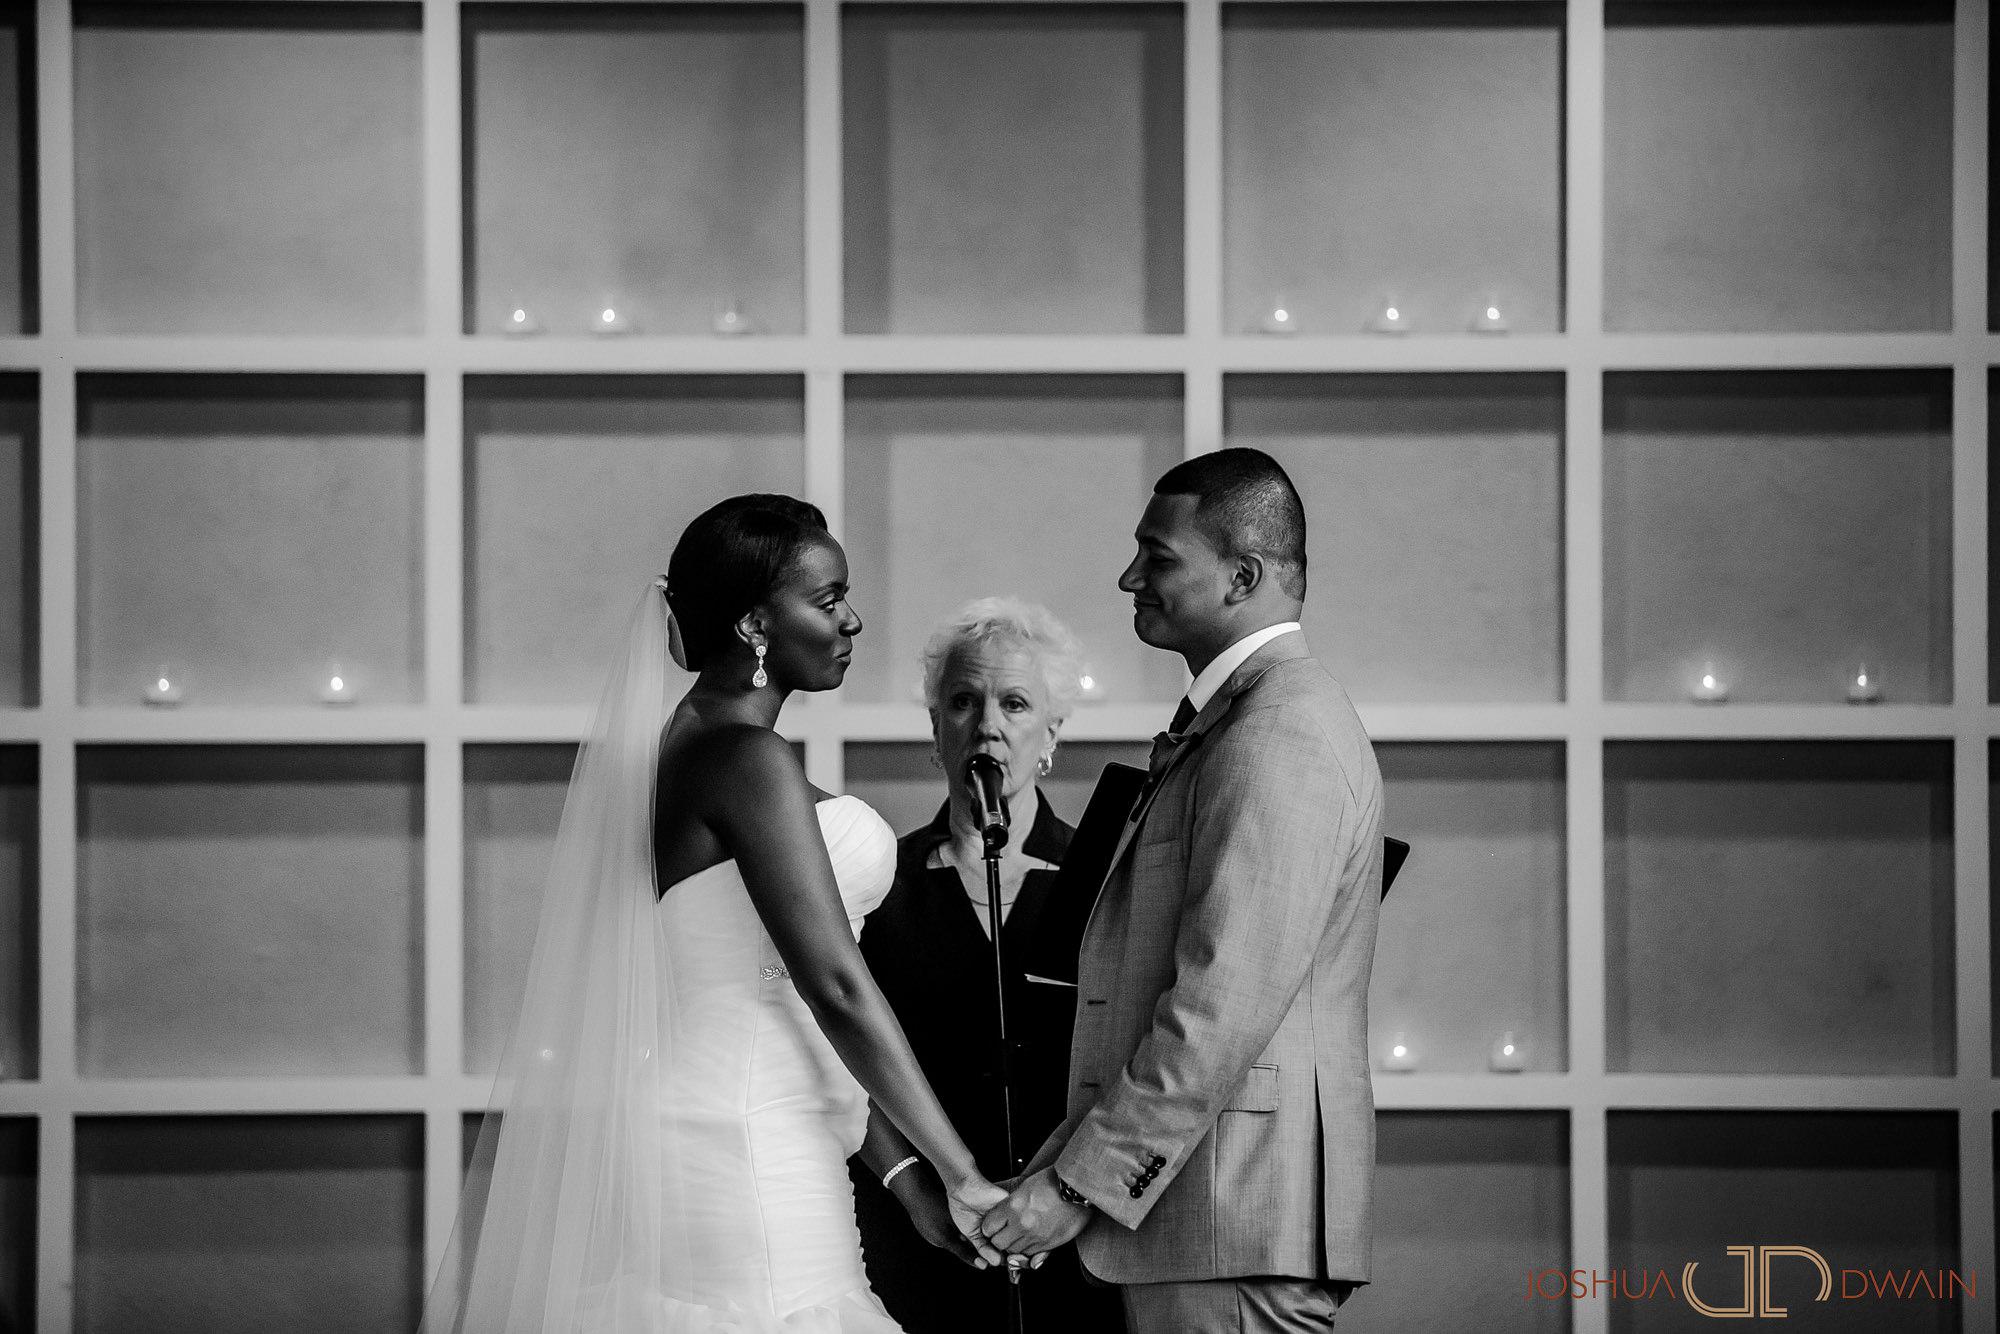 anna-edwin-019-stone-house-warren-new-jersey-wedding-photographer-joshua-dwain